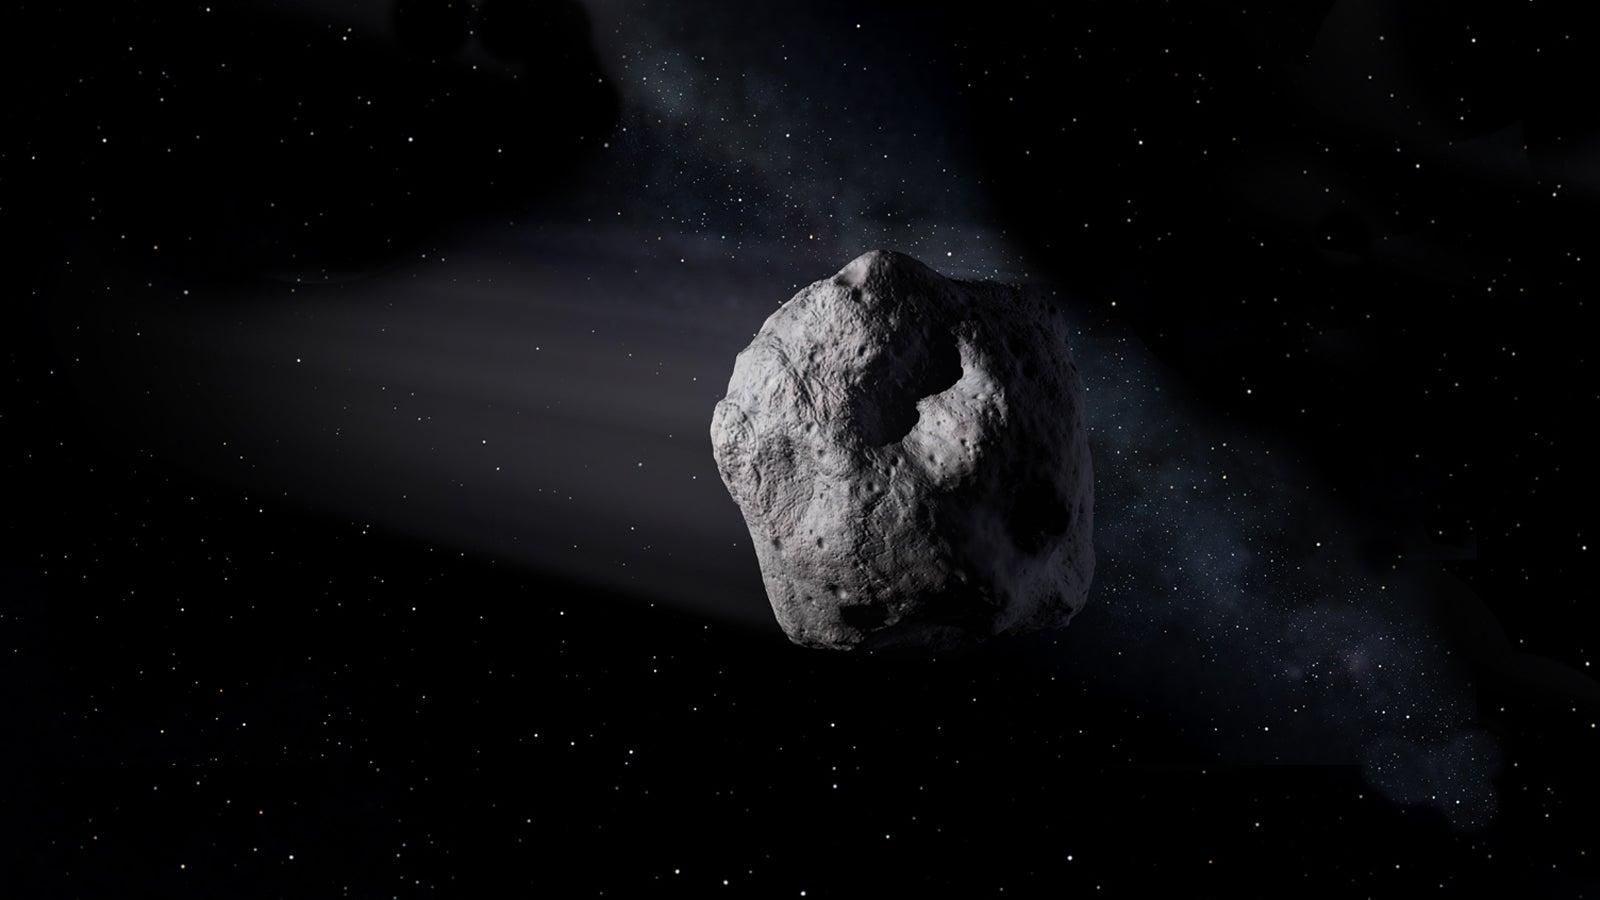 a meteorite in space